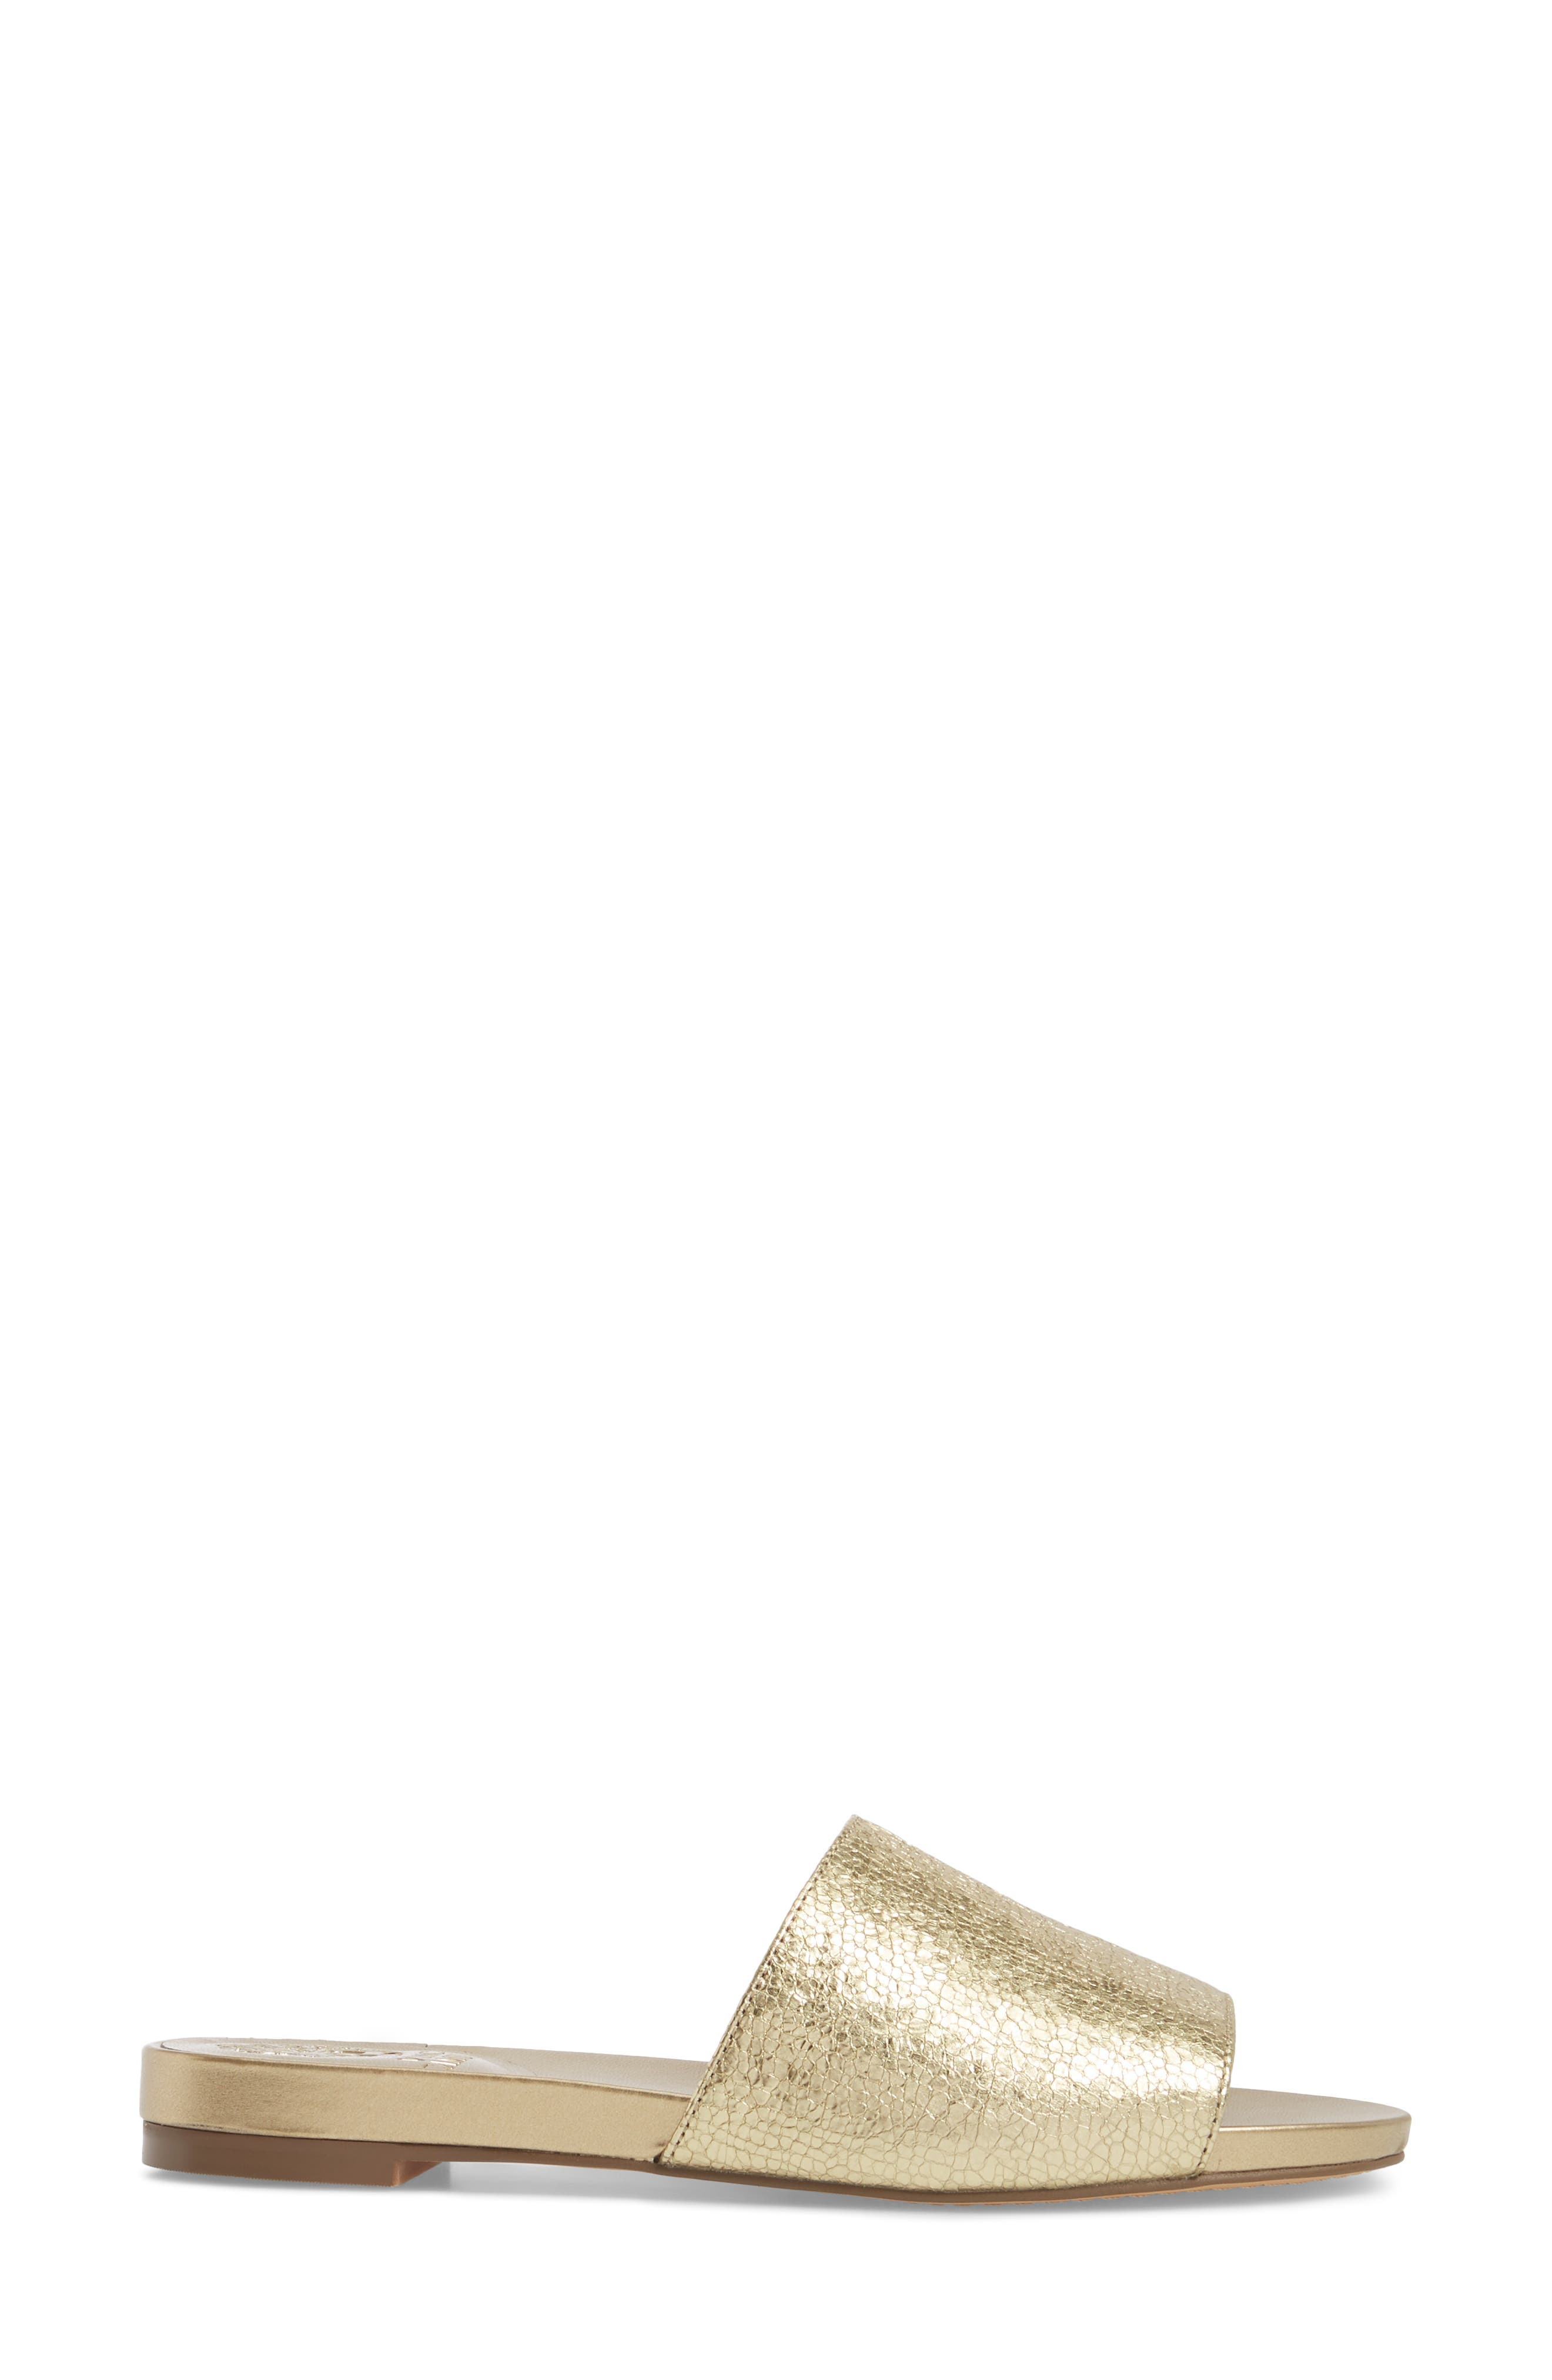 Haydan Slide Sandal,                             Alternate thumbnail 3, color,                             Karat Gold Fabric